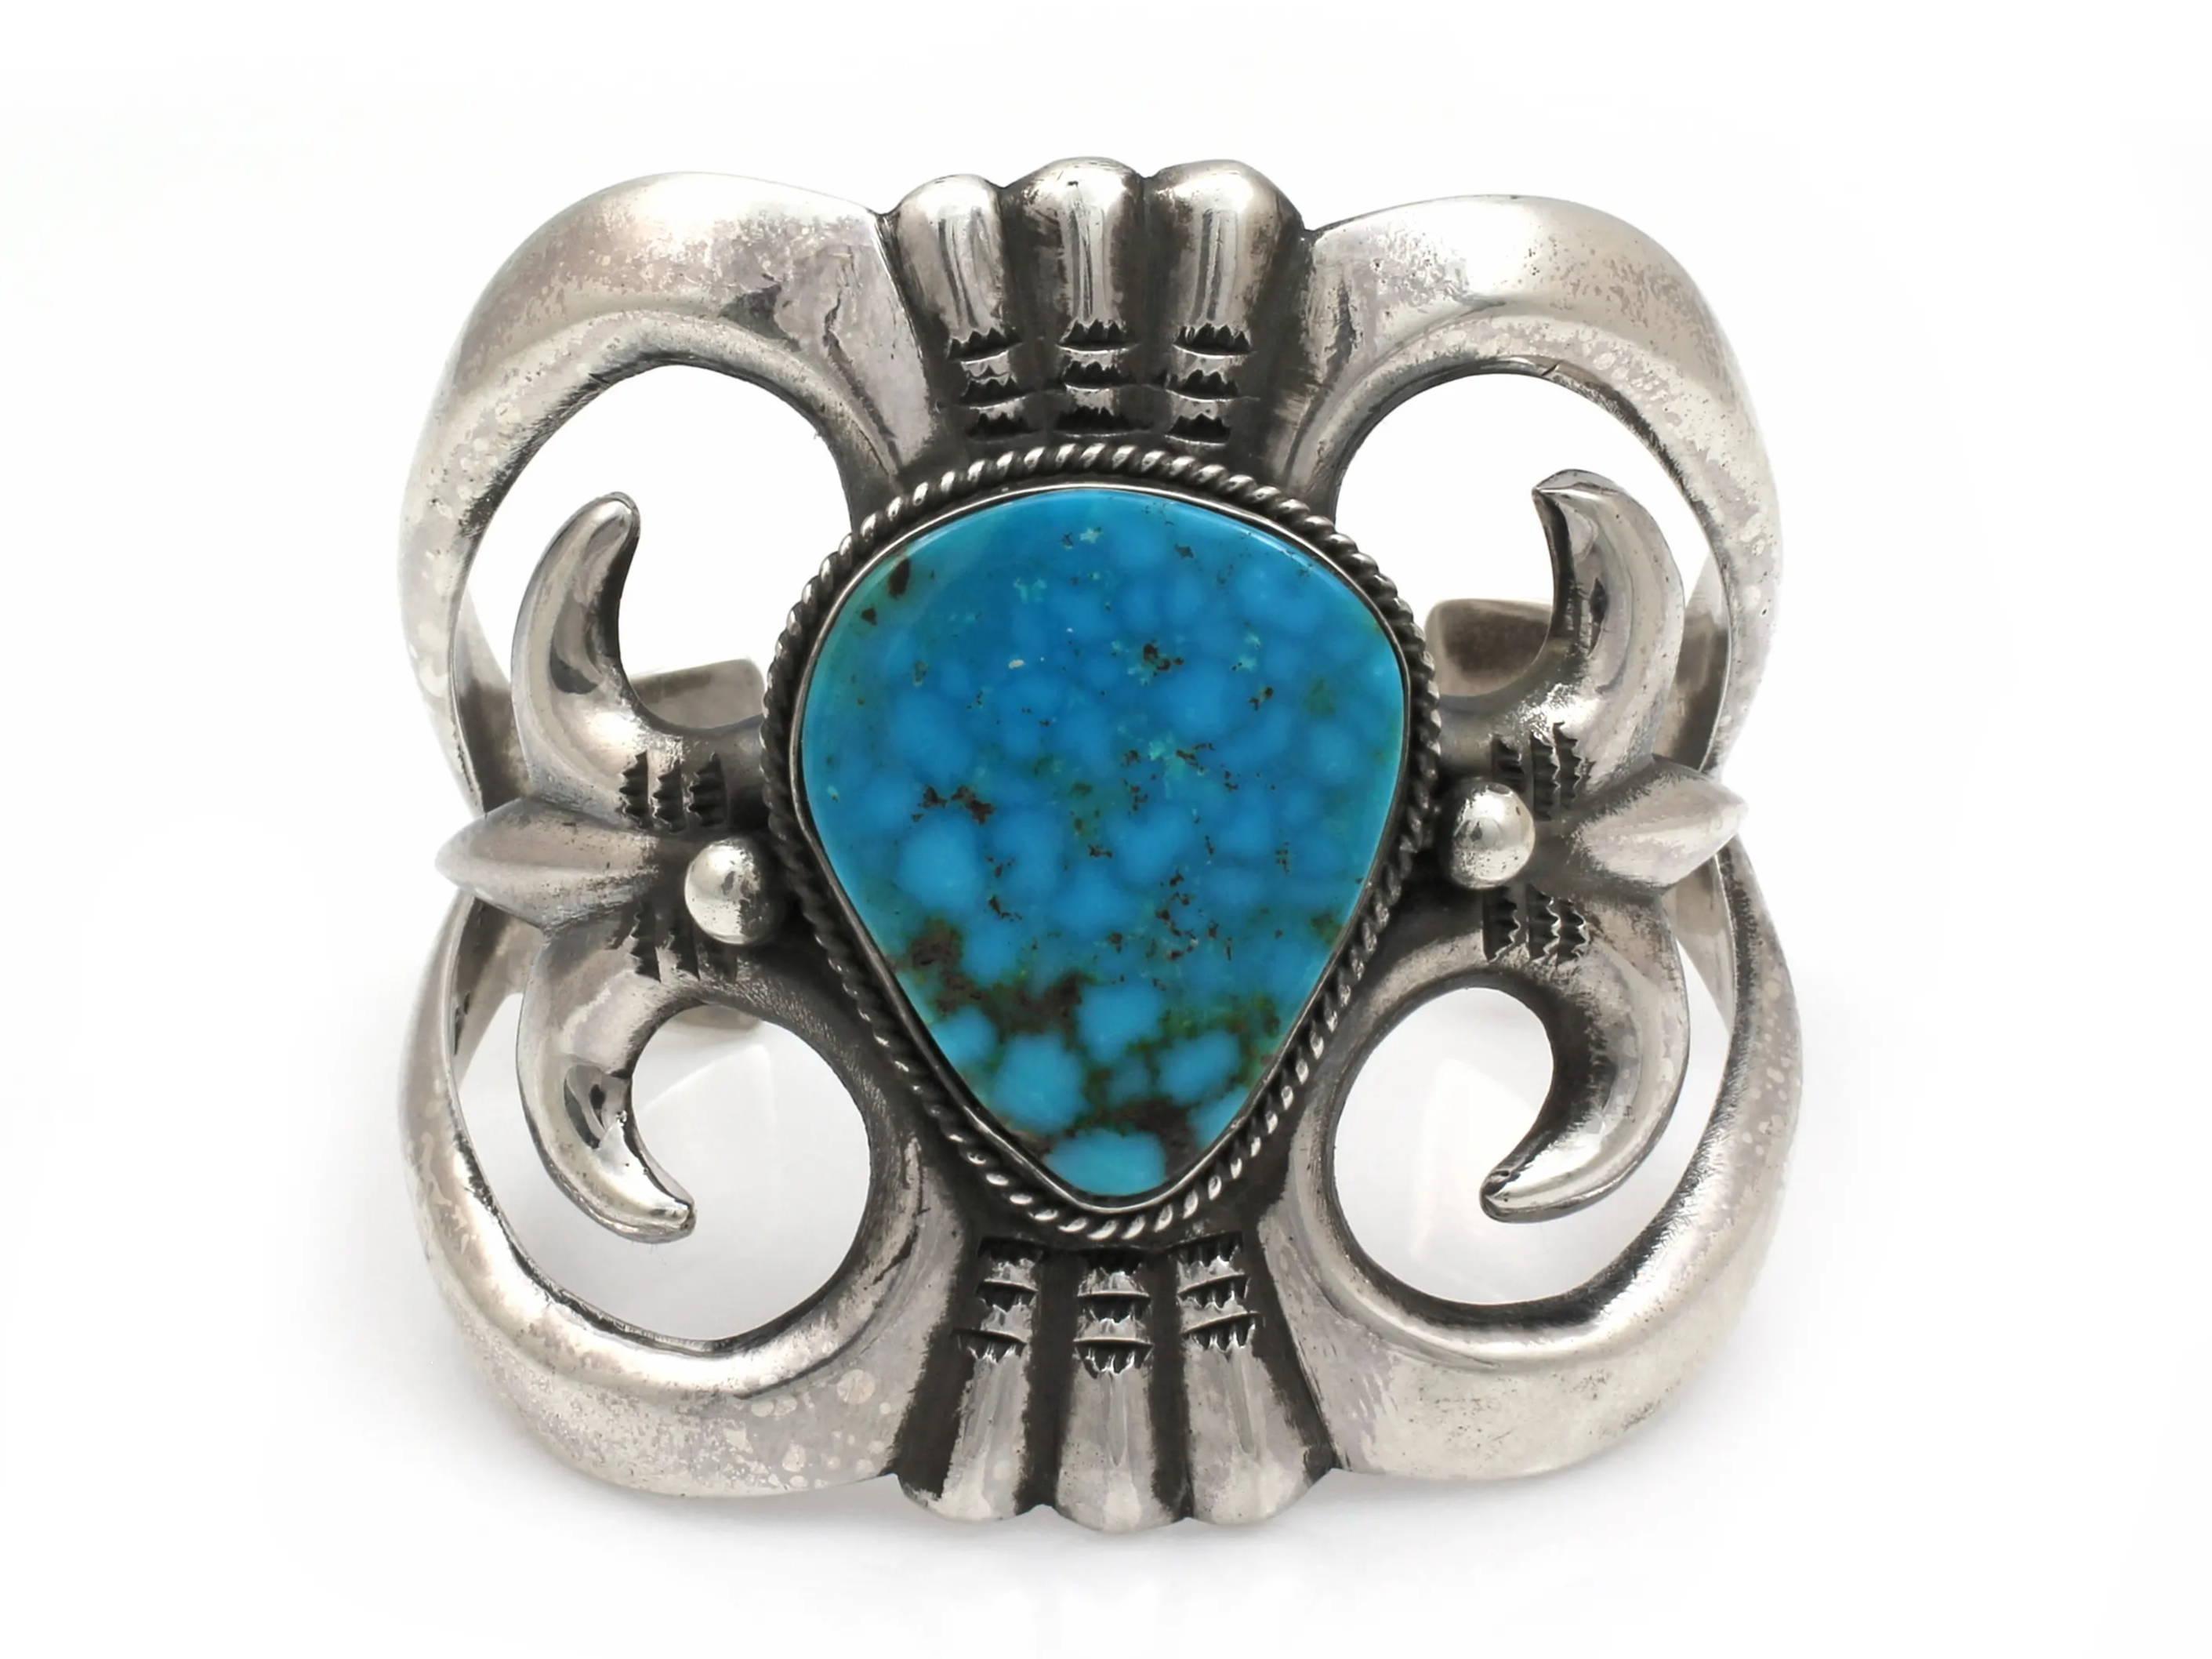 NAVAJO JEWELRY. santa fe art gallery. Begay Turquoise jewelry. native american jewelry